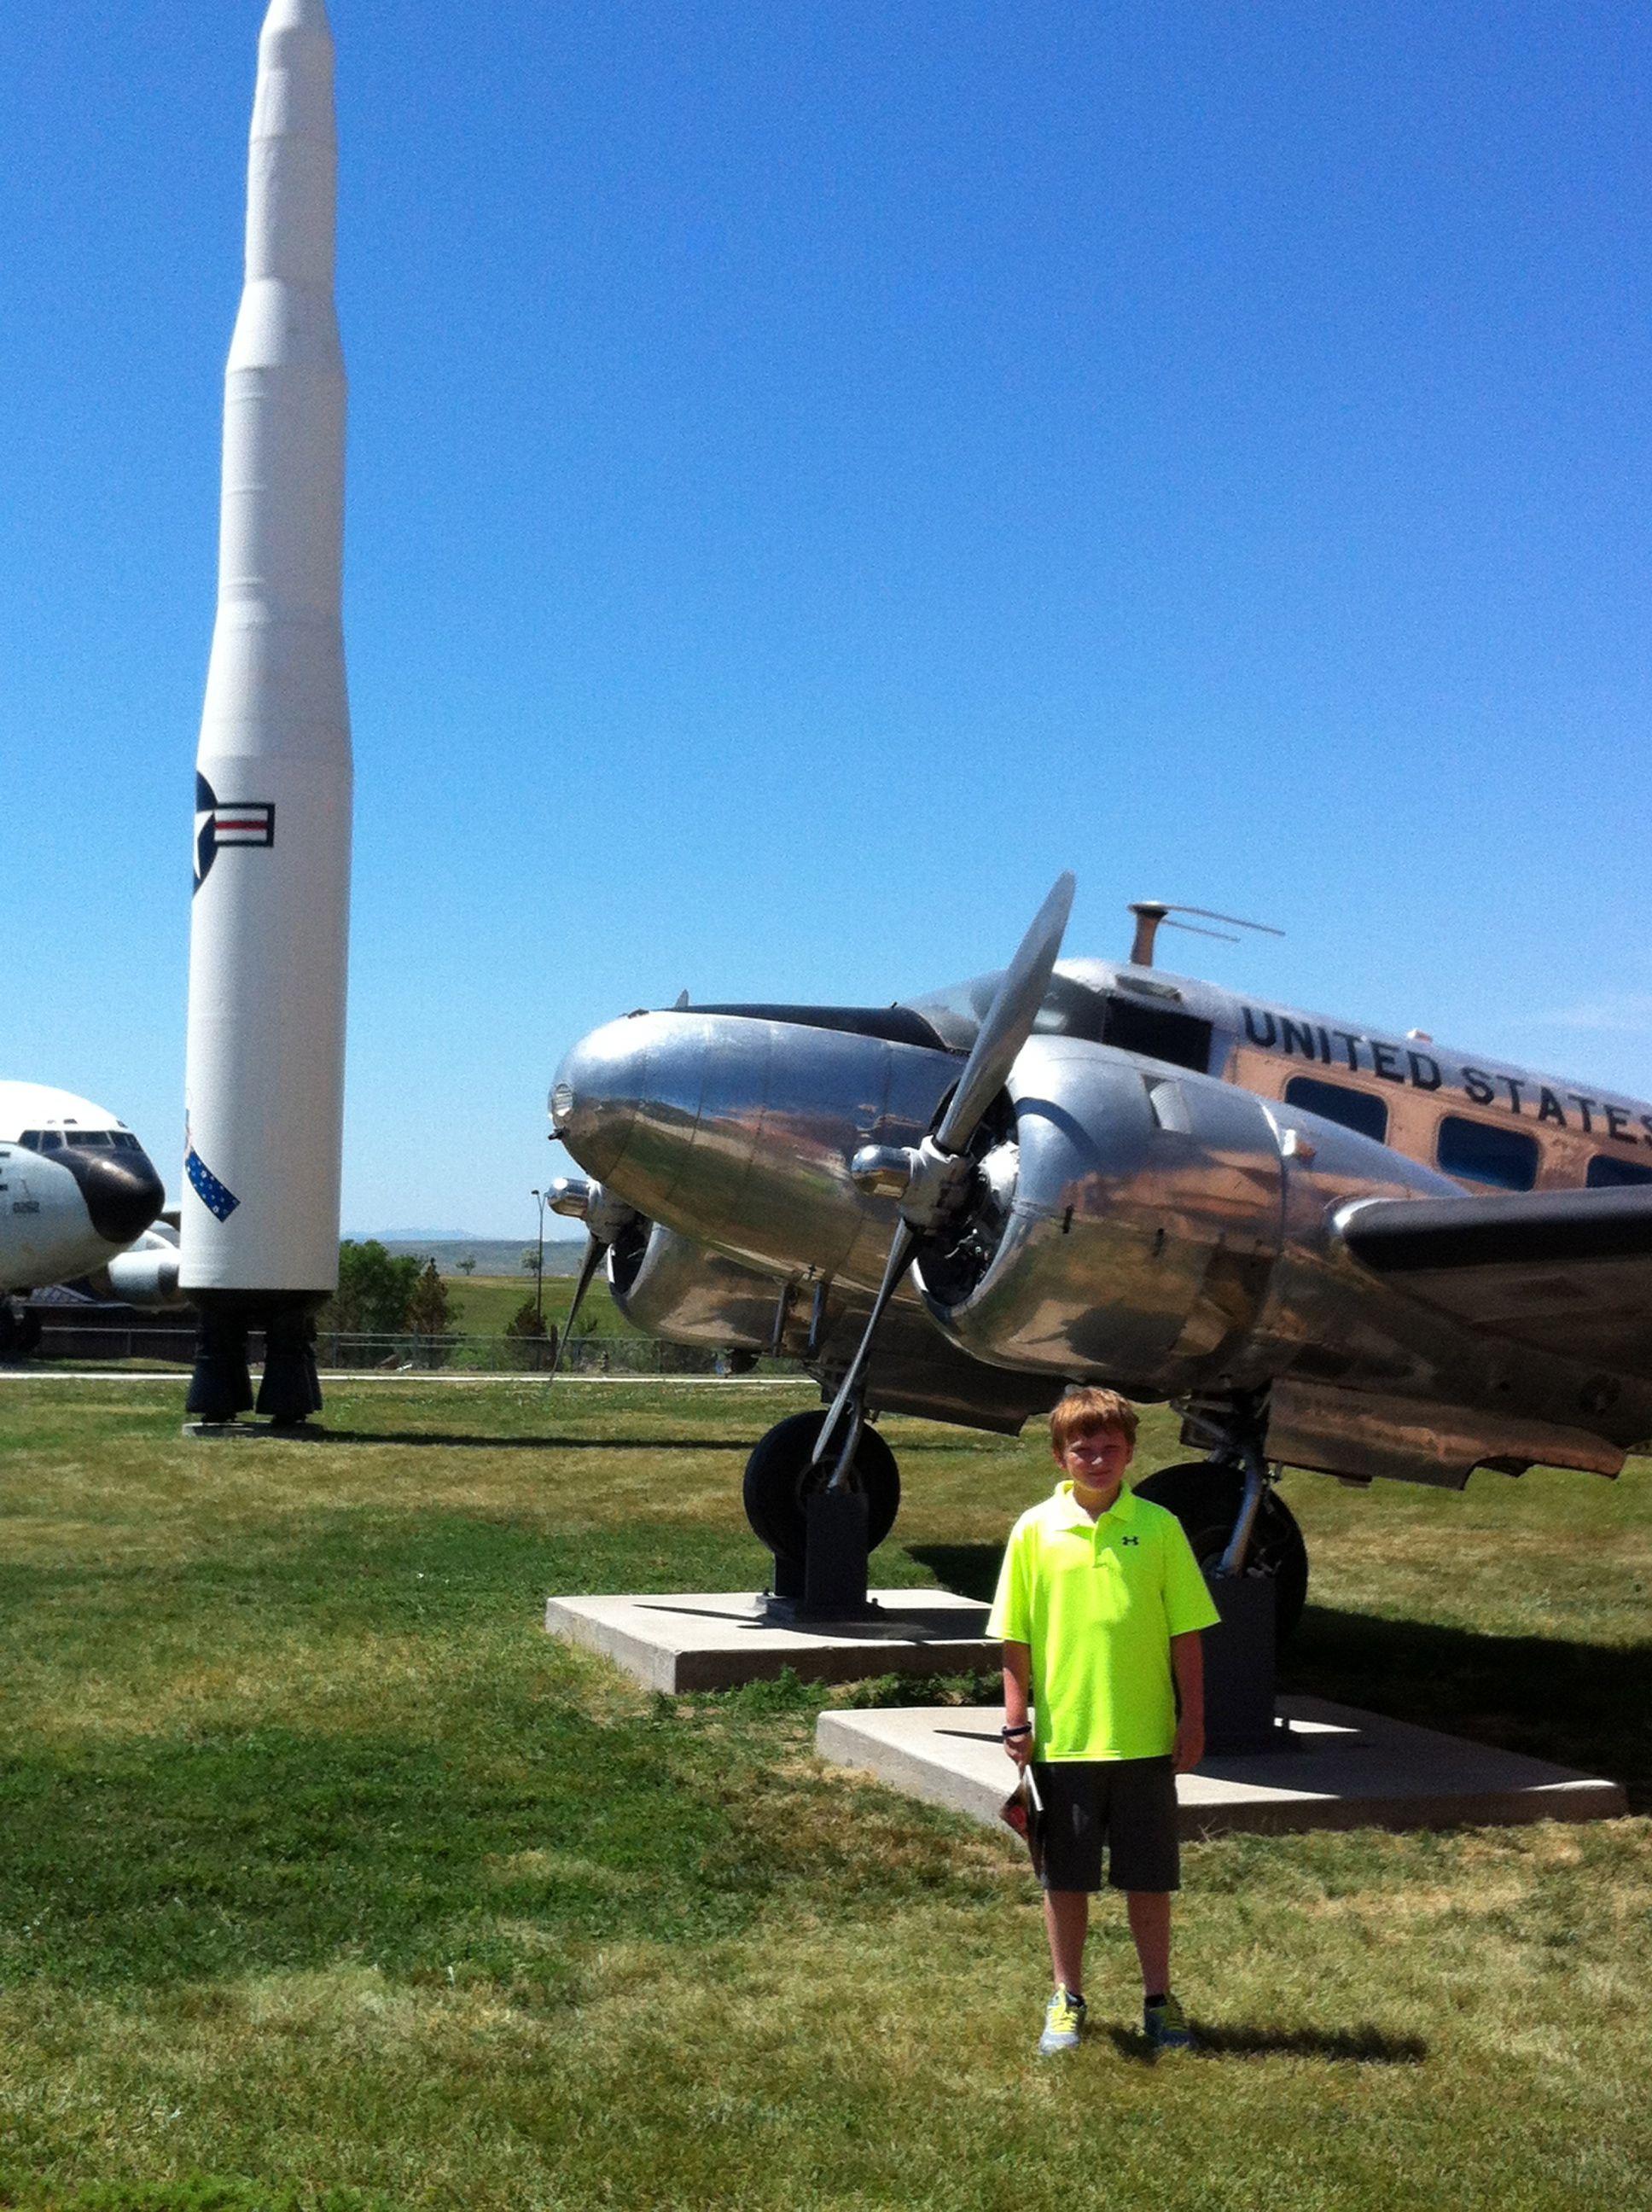 South Dakota Air and Space Museum, Ellsworth Air Force